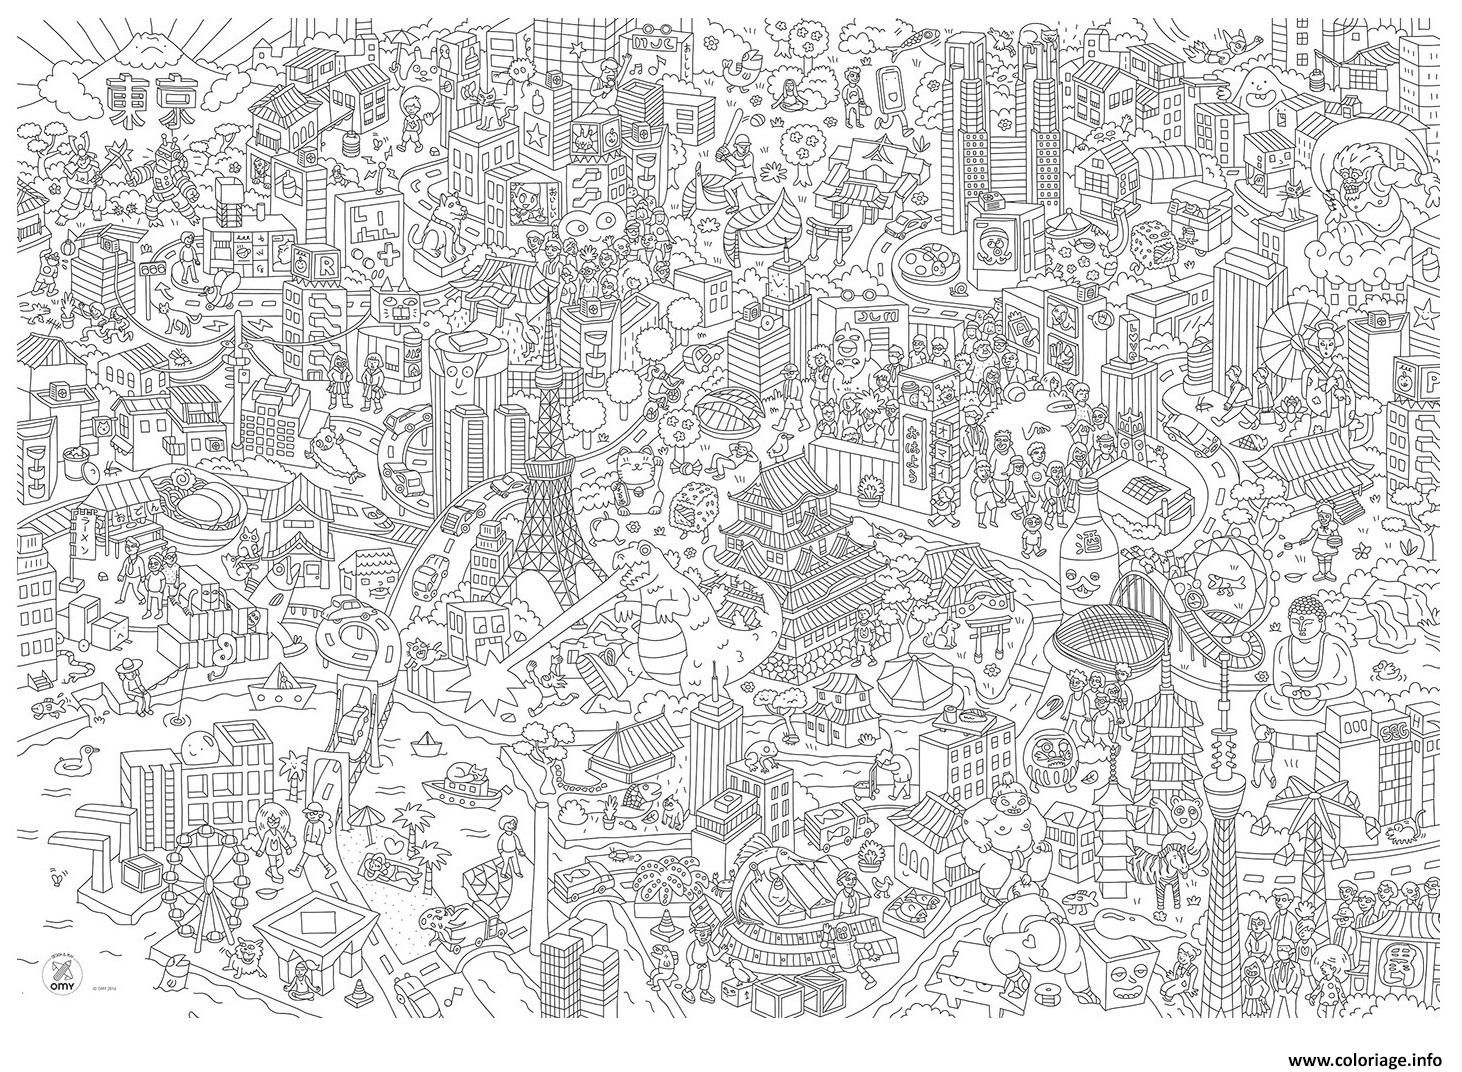 Coloriage xxl omy grand poster a colorier tokyo Dessin à Imprimer